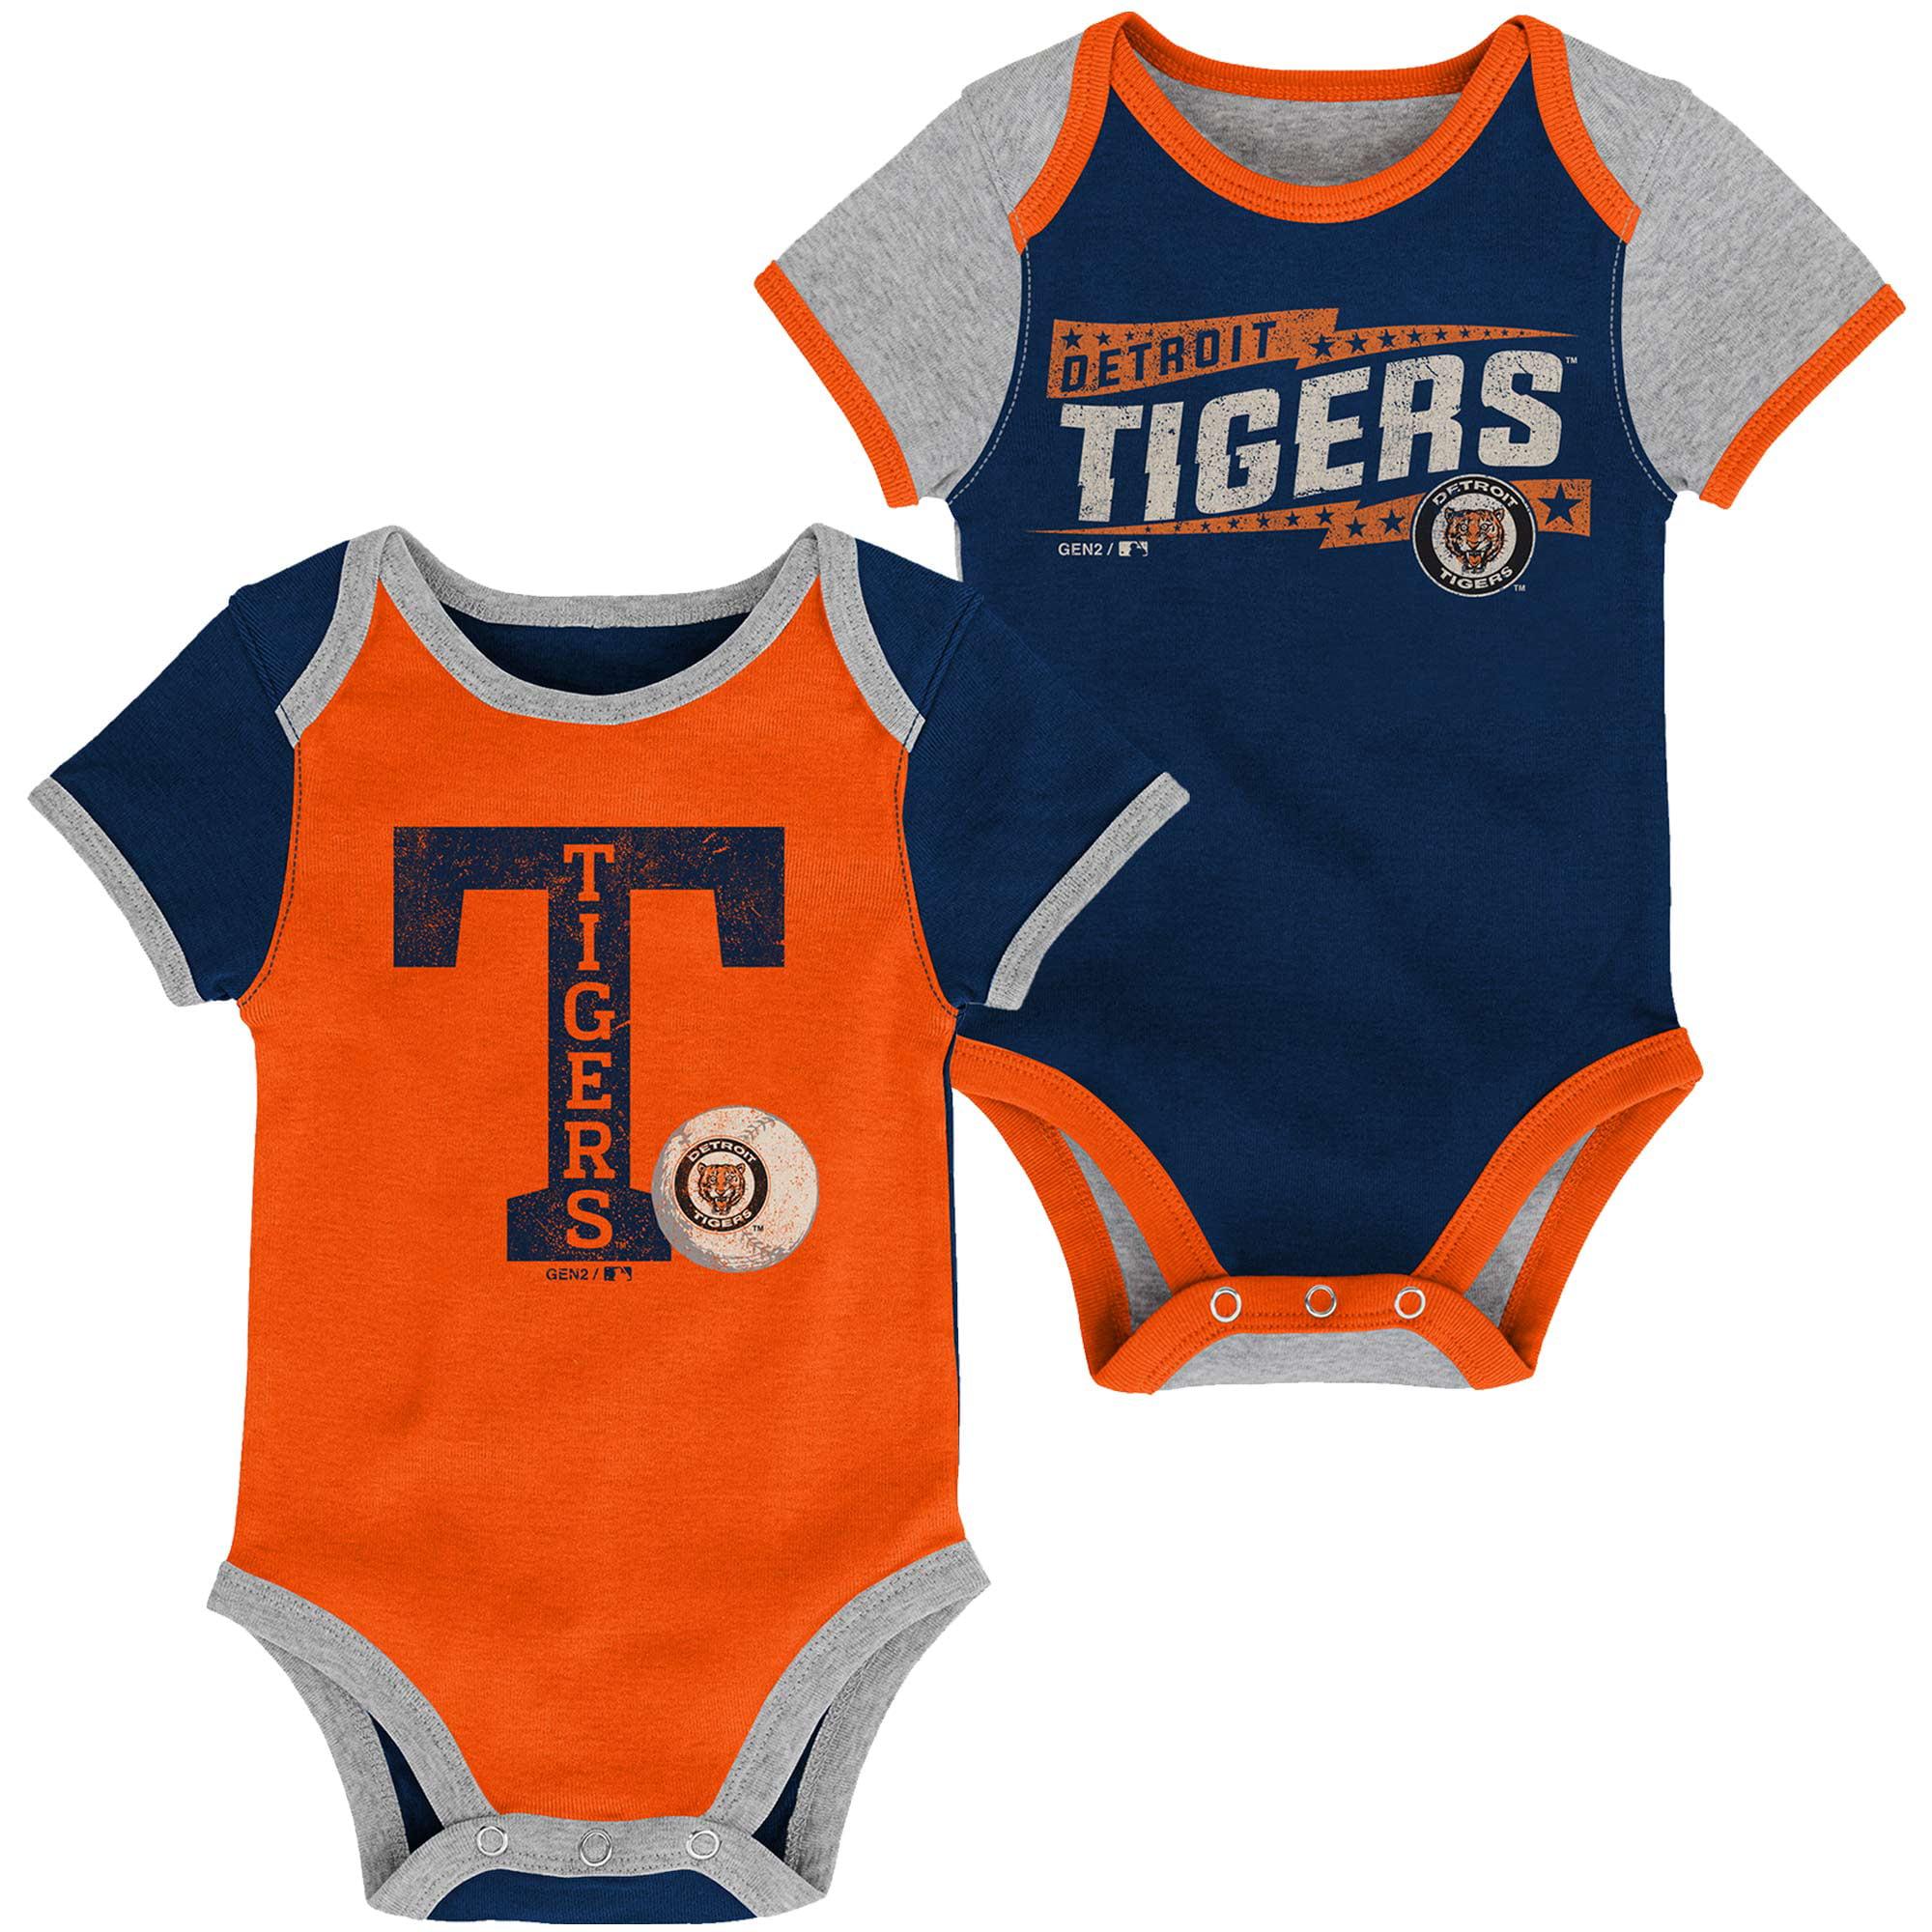 Detroit Tigers Newborn Baseball Star Two-Pack Bodysuit Set - Navy/Orange